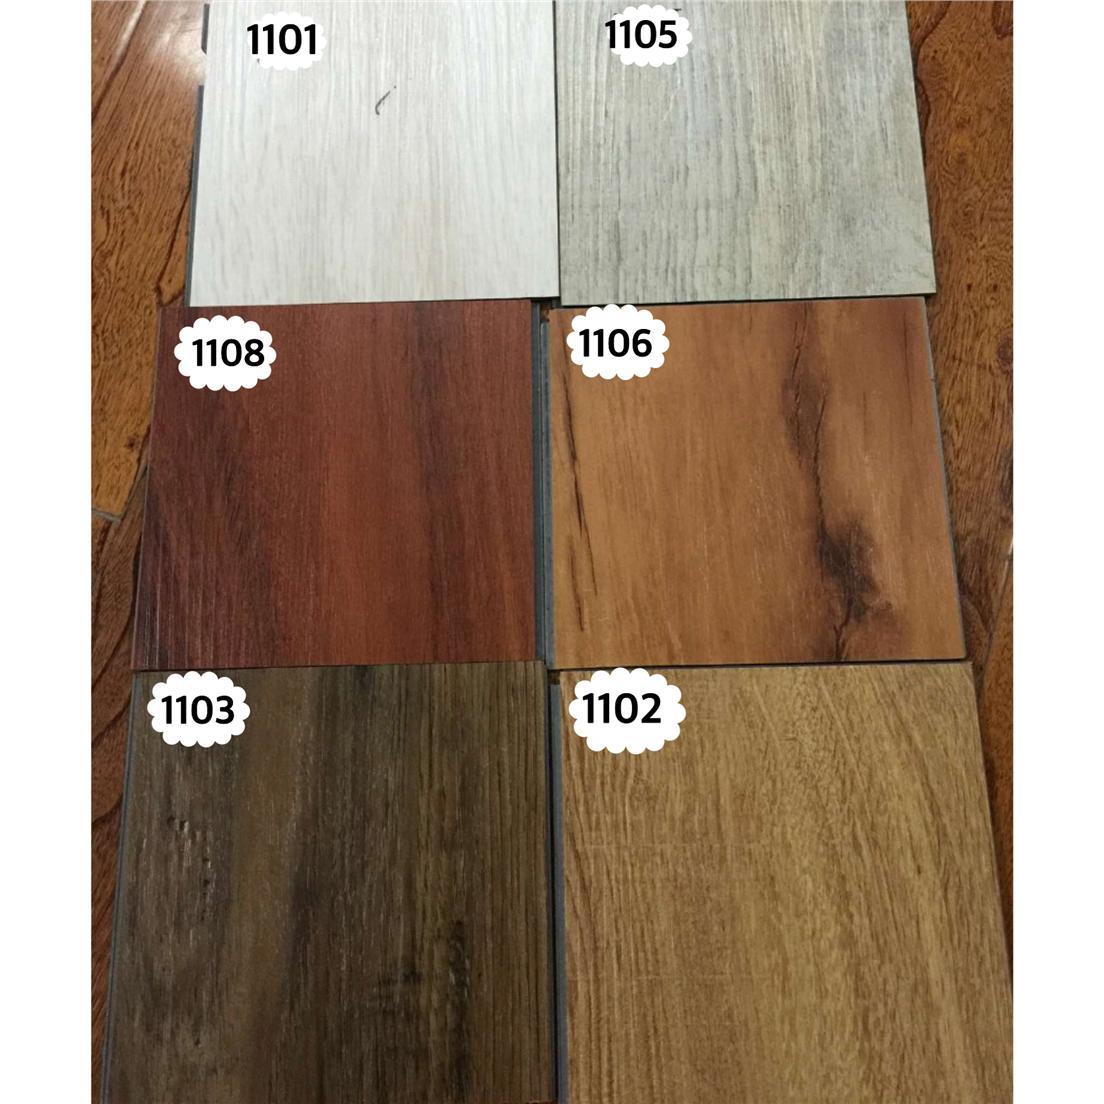 Wooden floor tile adhesive